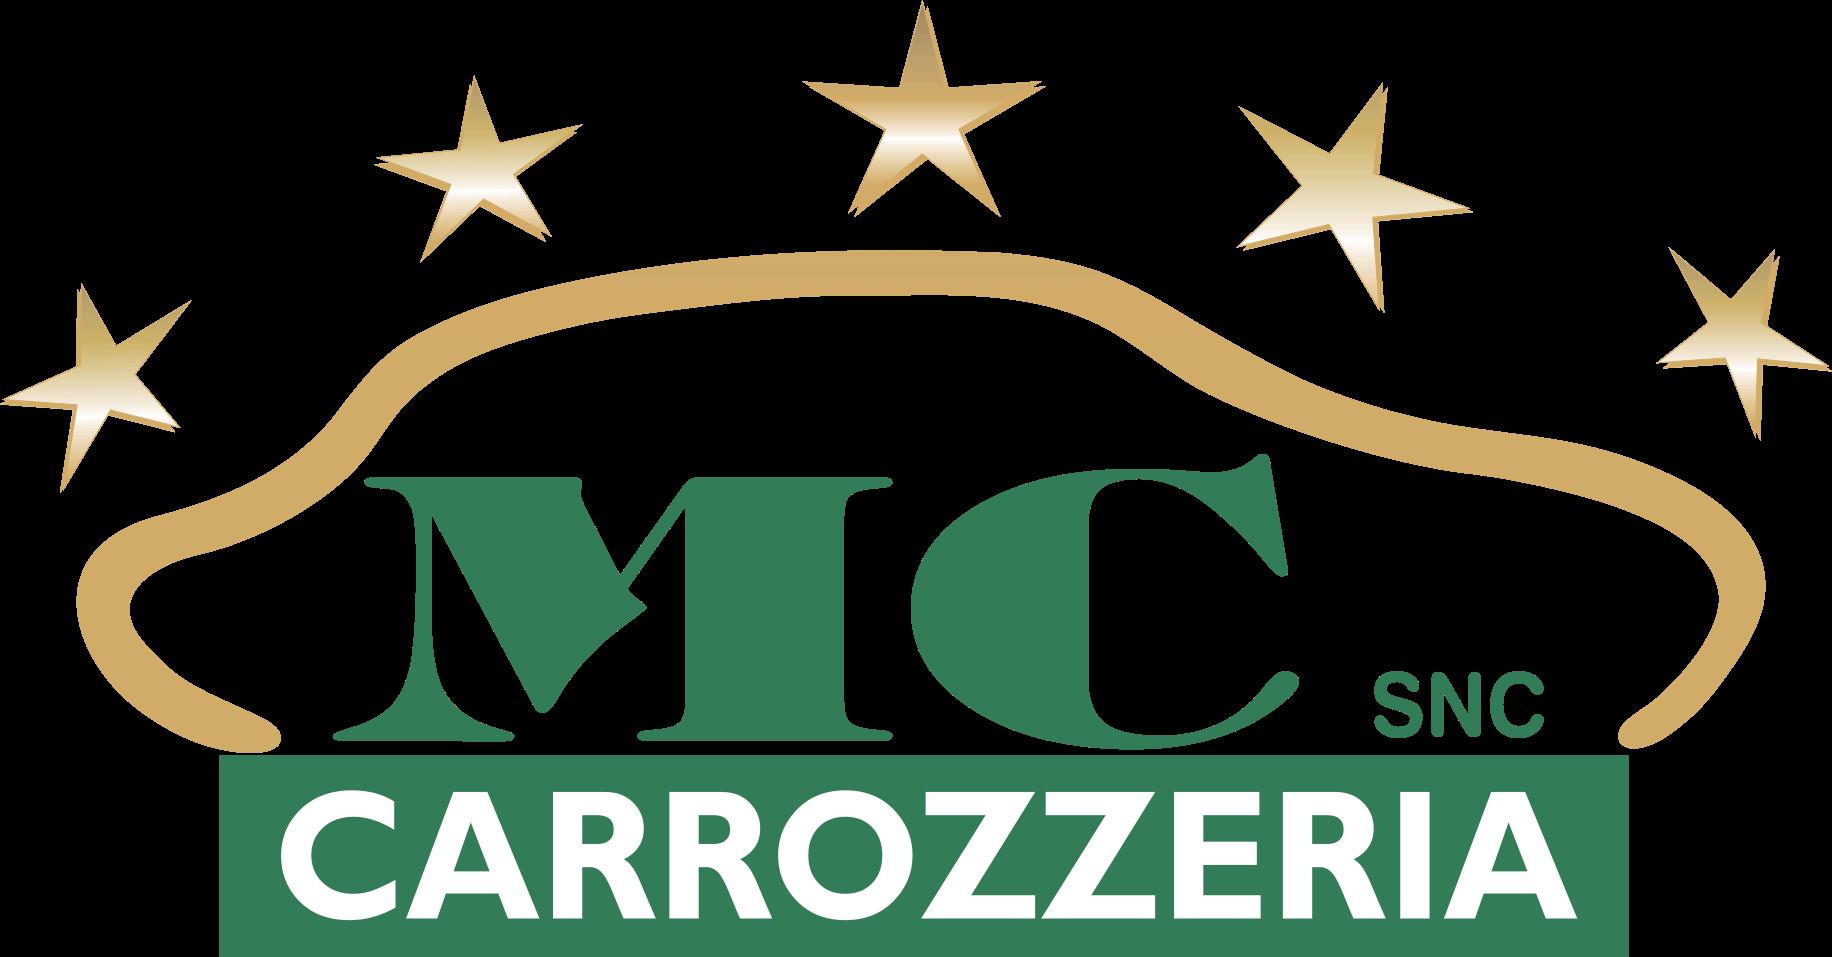 Carrozzeria MC